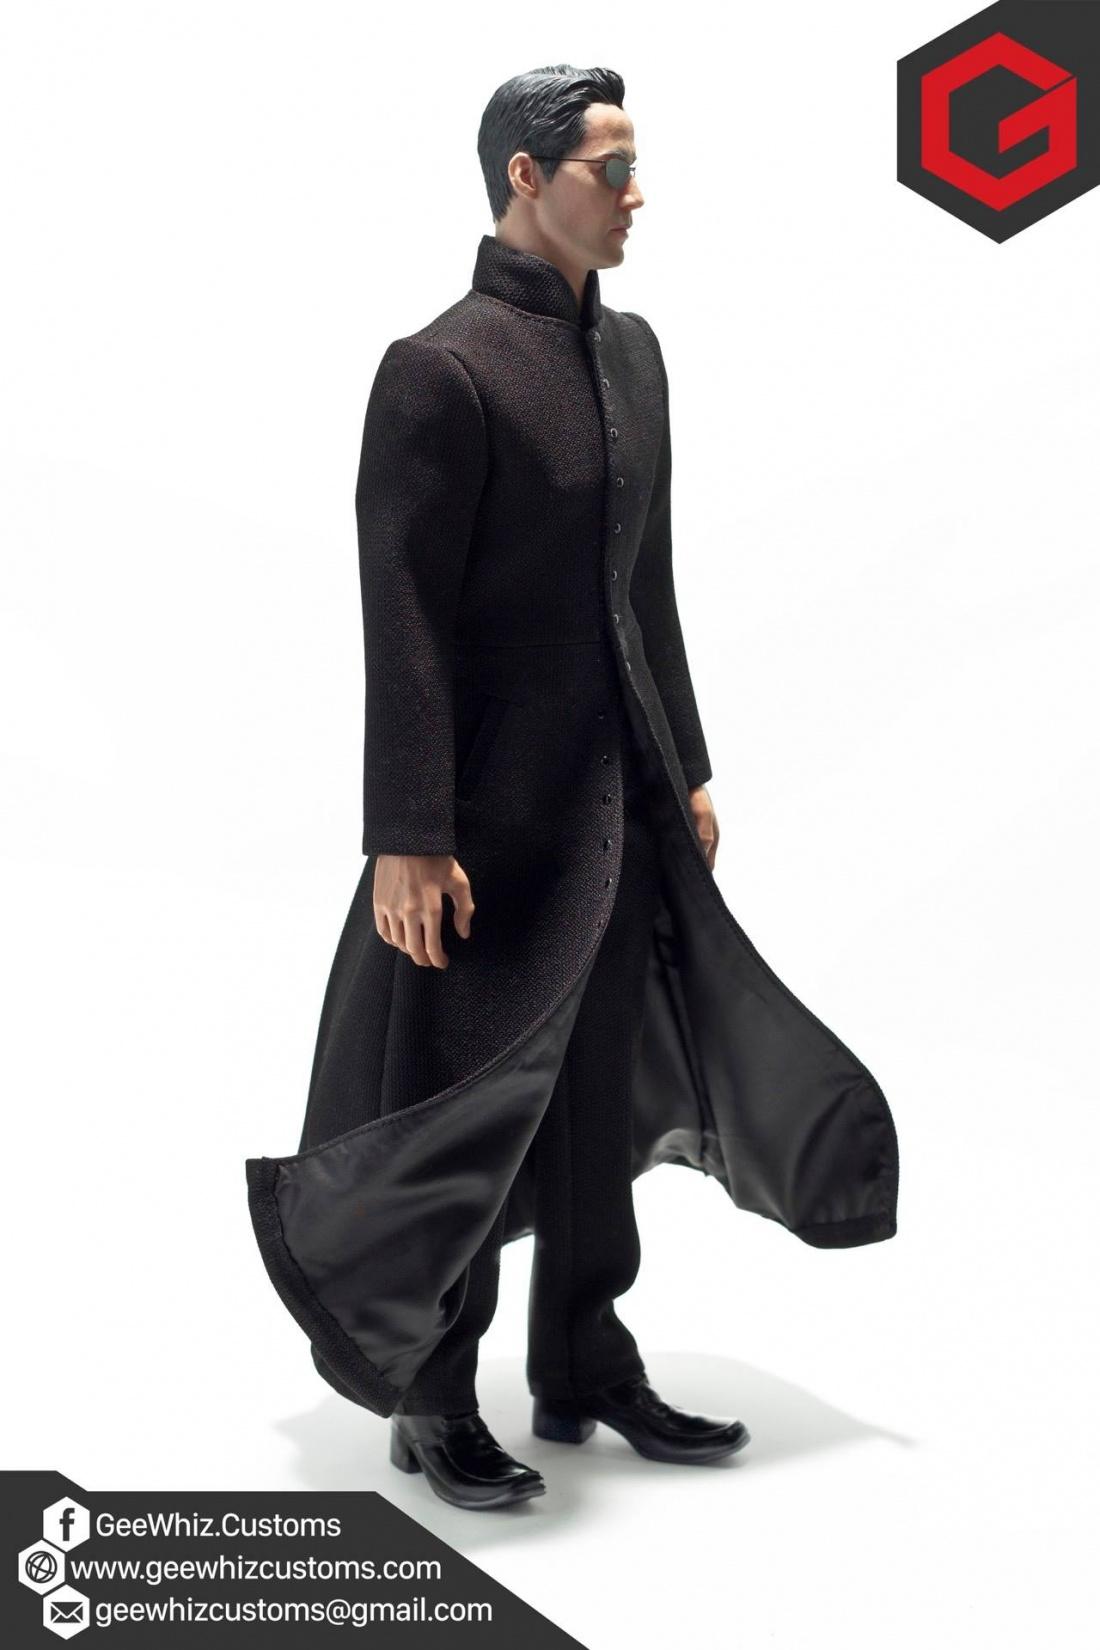 matrix clothing gallery